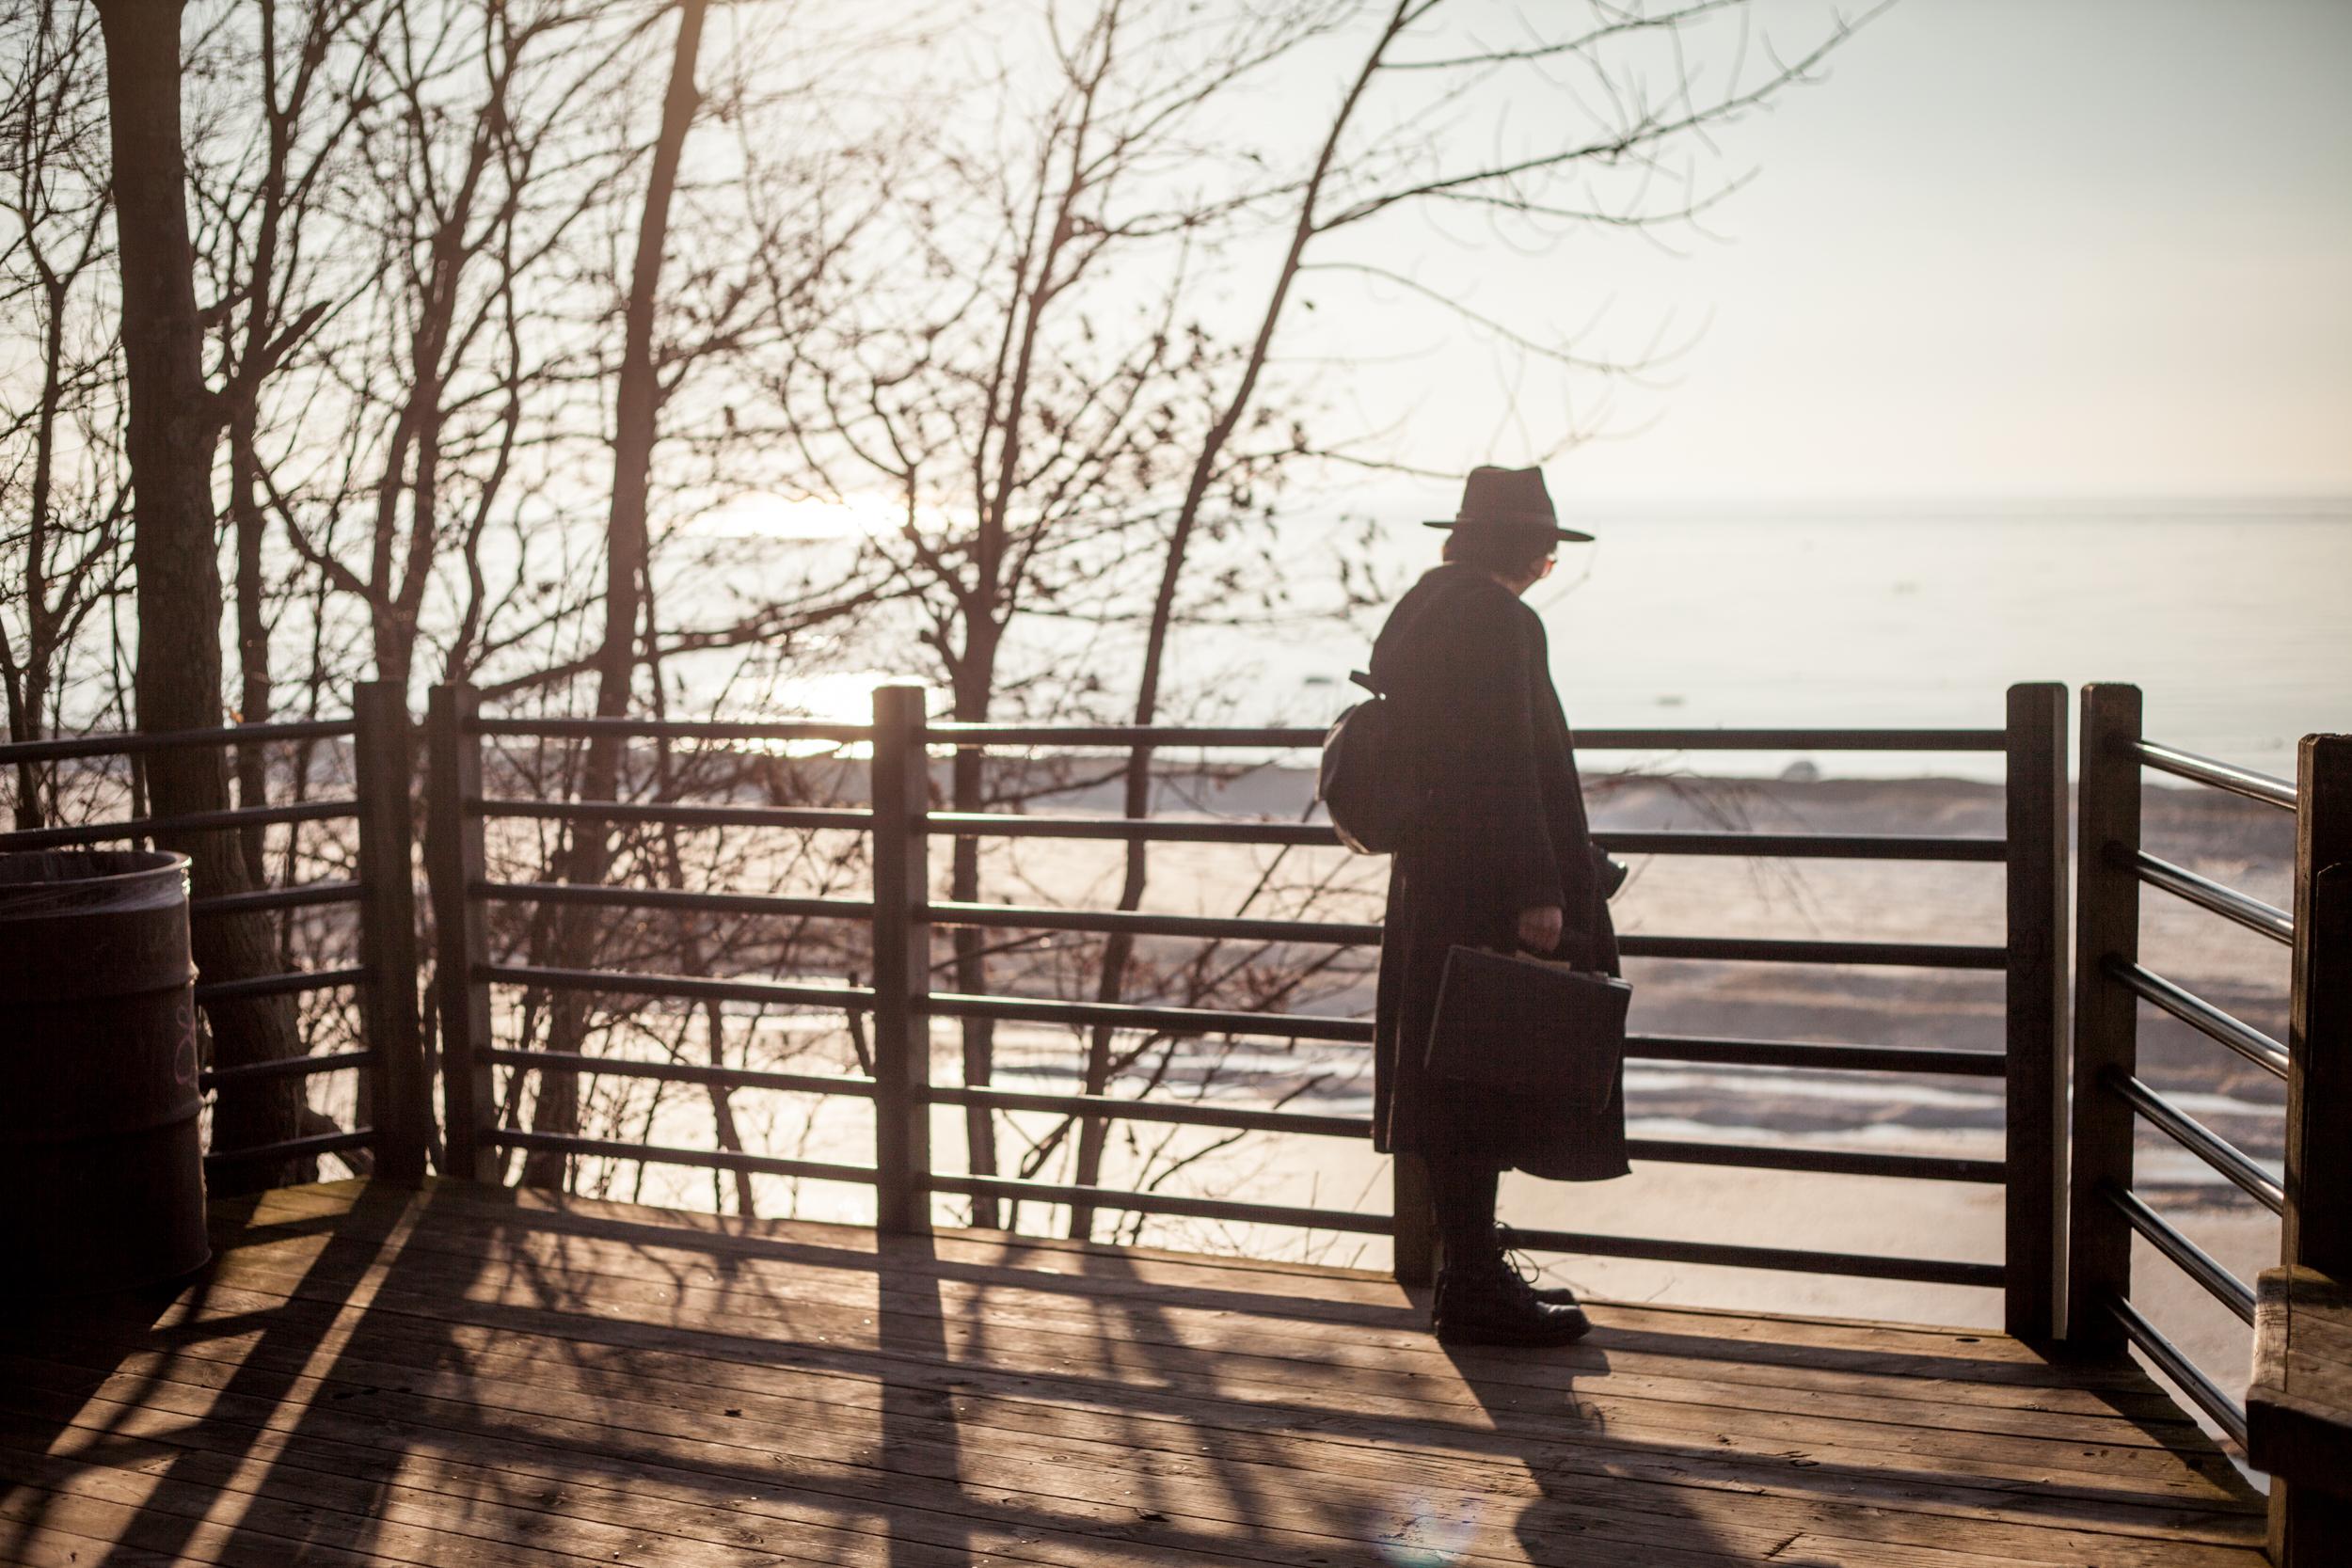 Awayaway_MeganLendmanPhotography-2.jpg